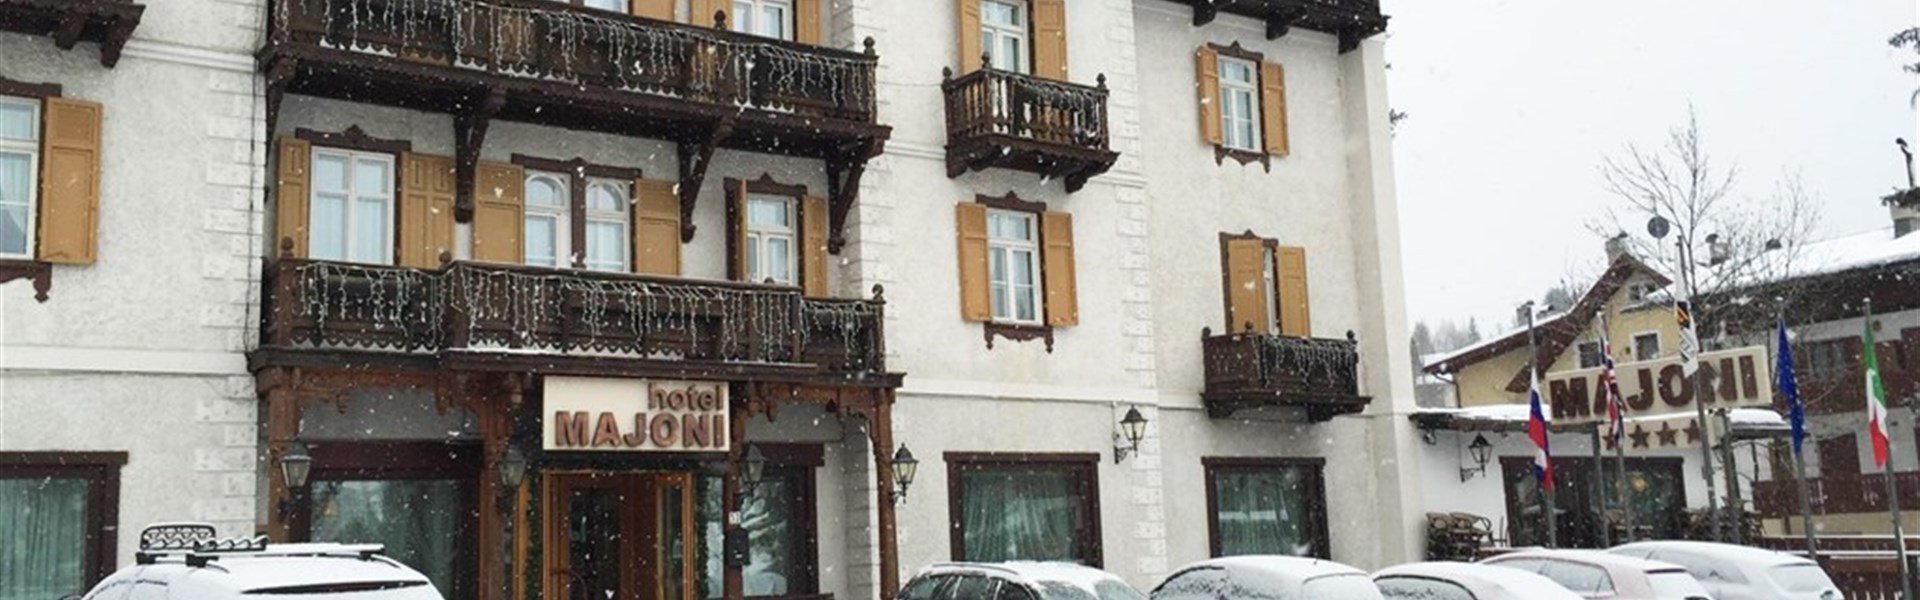 Marco Polo - Hotel Majoni -